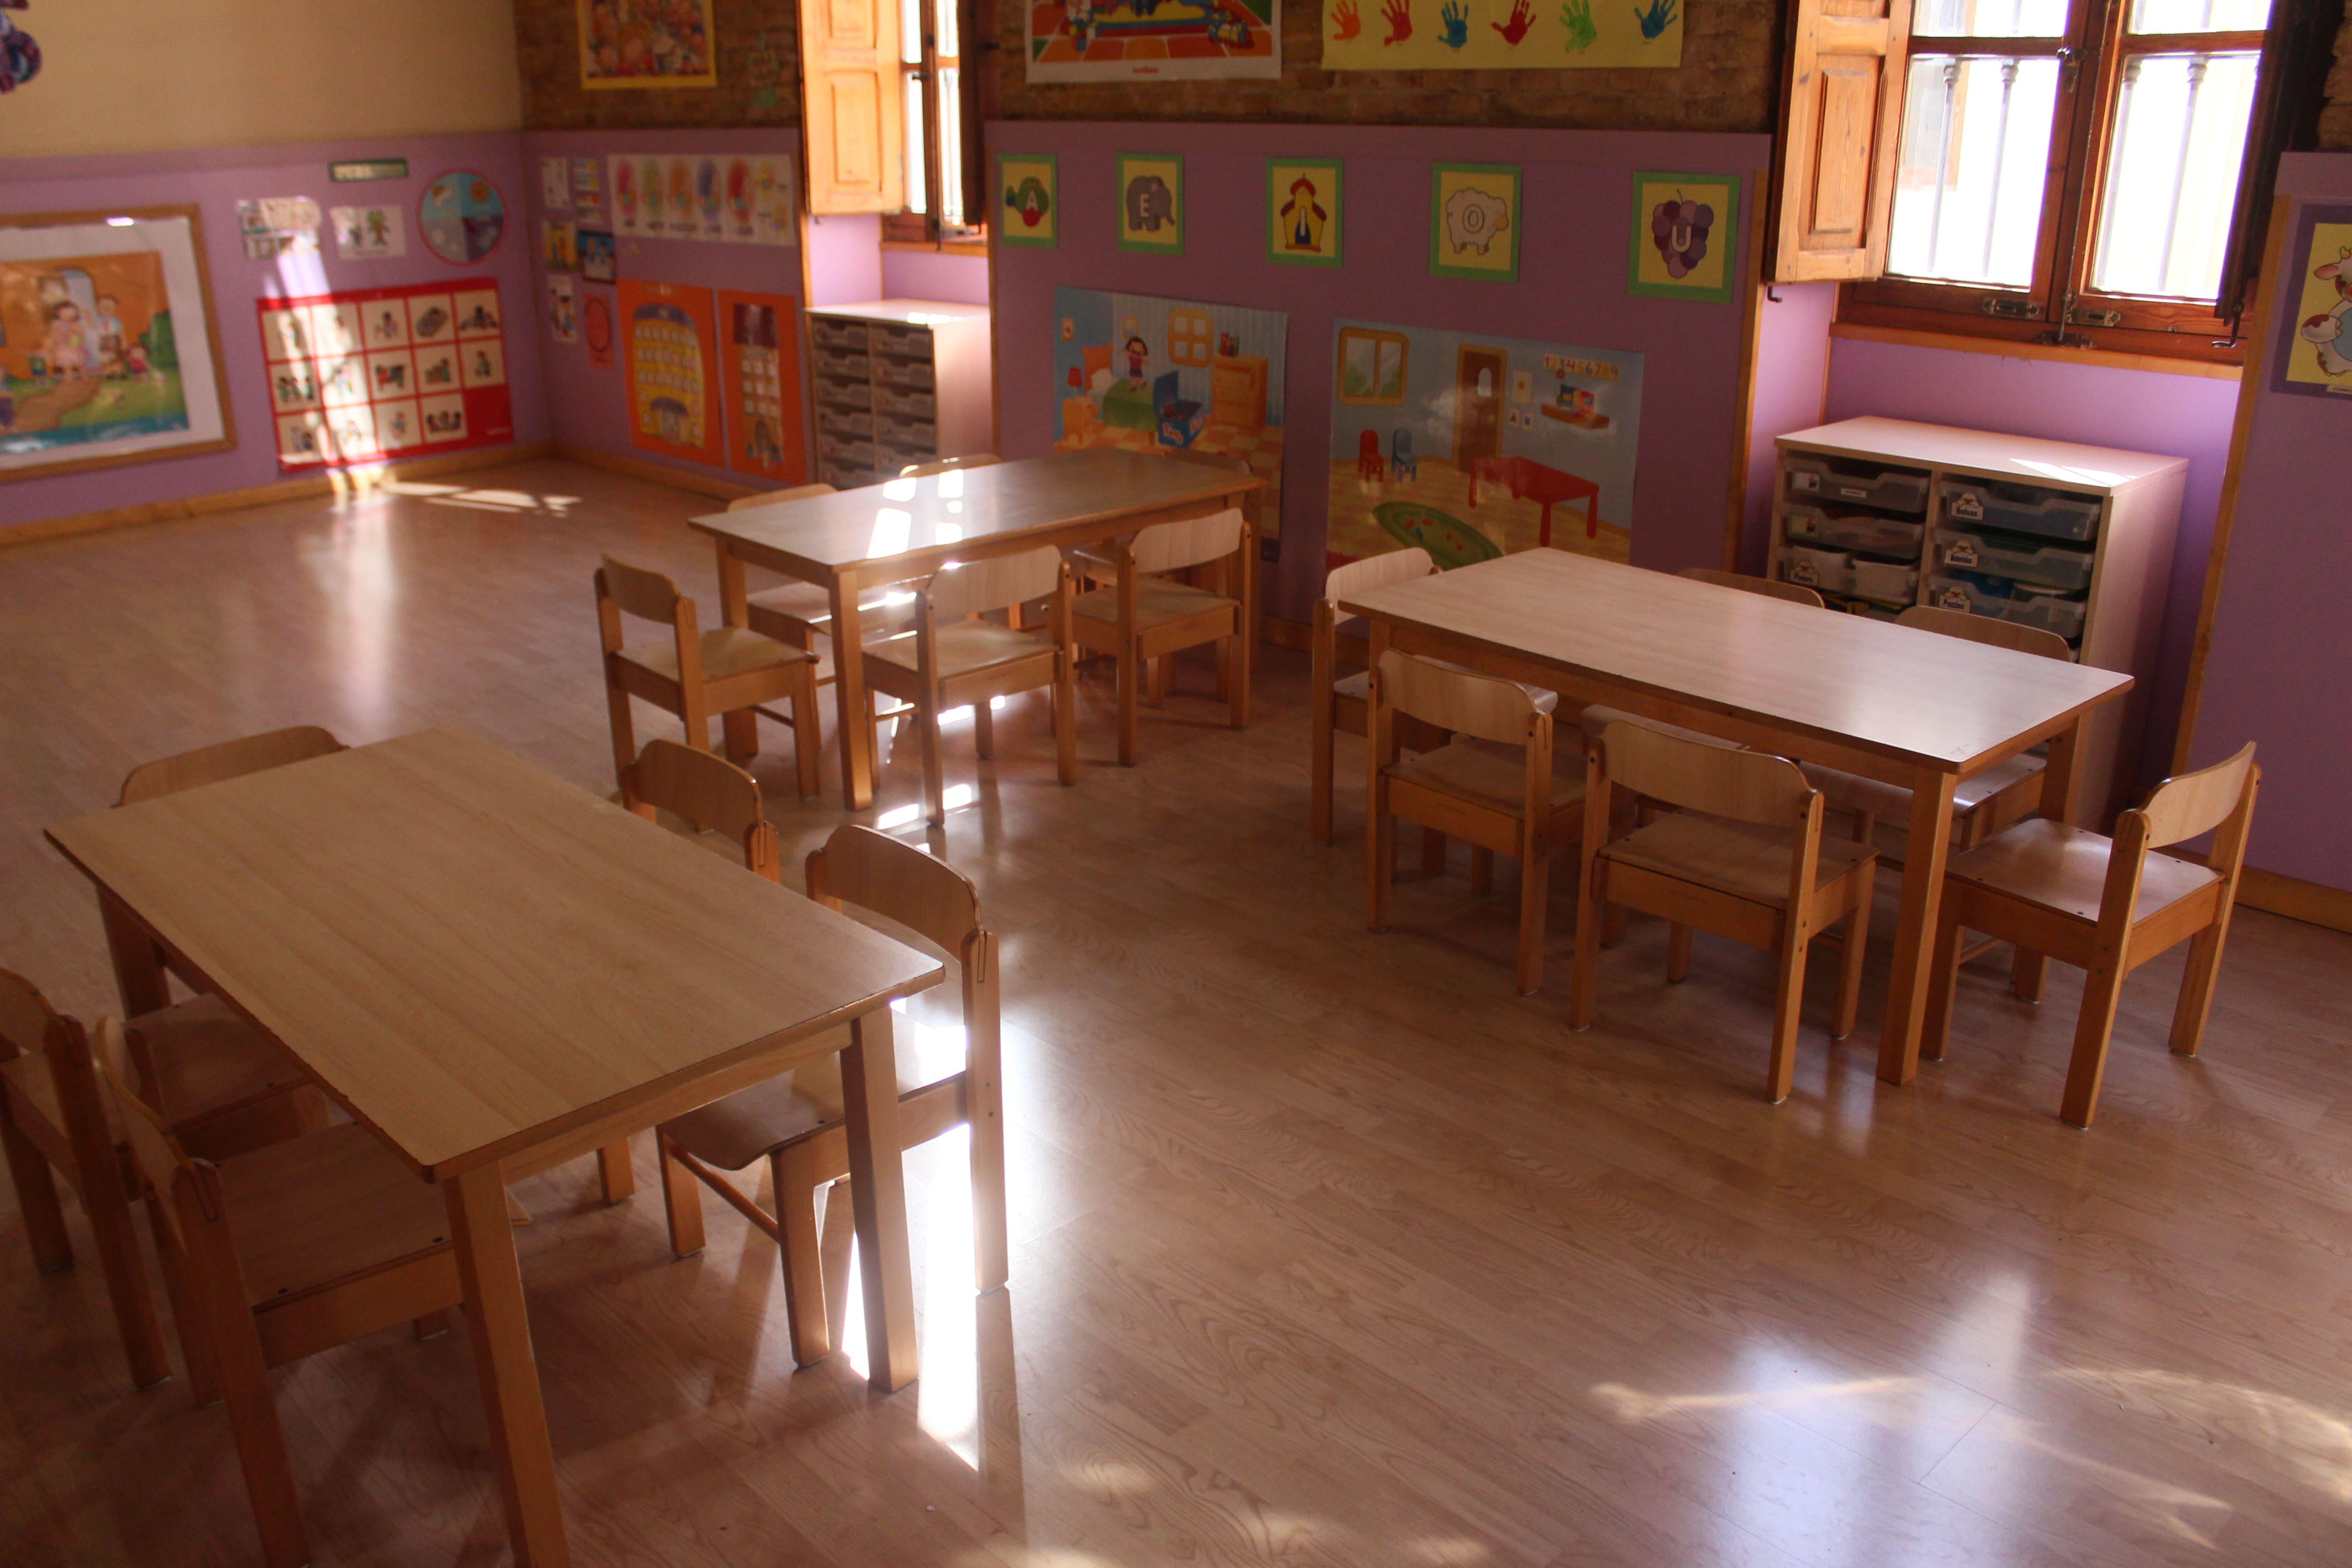 escuela infantil bilingüe en Valencia - clase iluminada